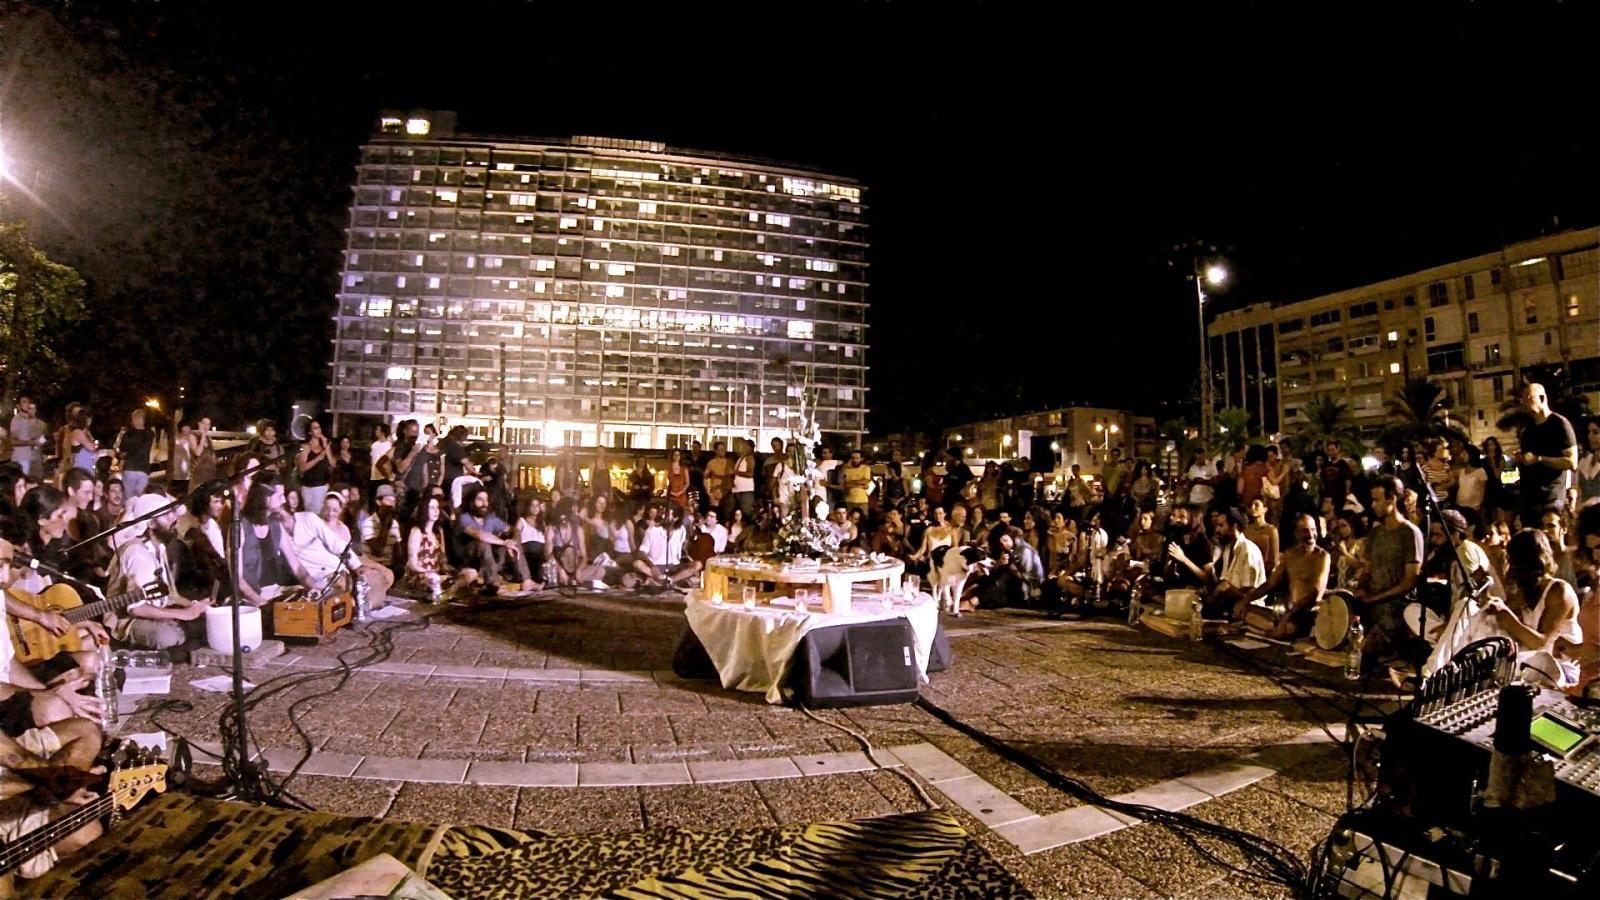 Unite in Babylon Israel - מעגלי שירה מקודשת בלב העיר